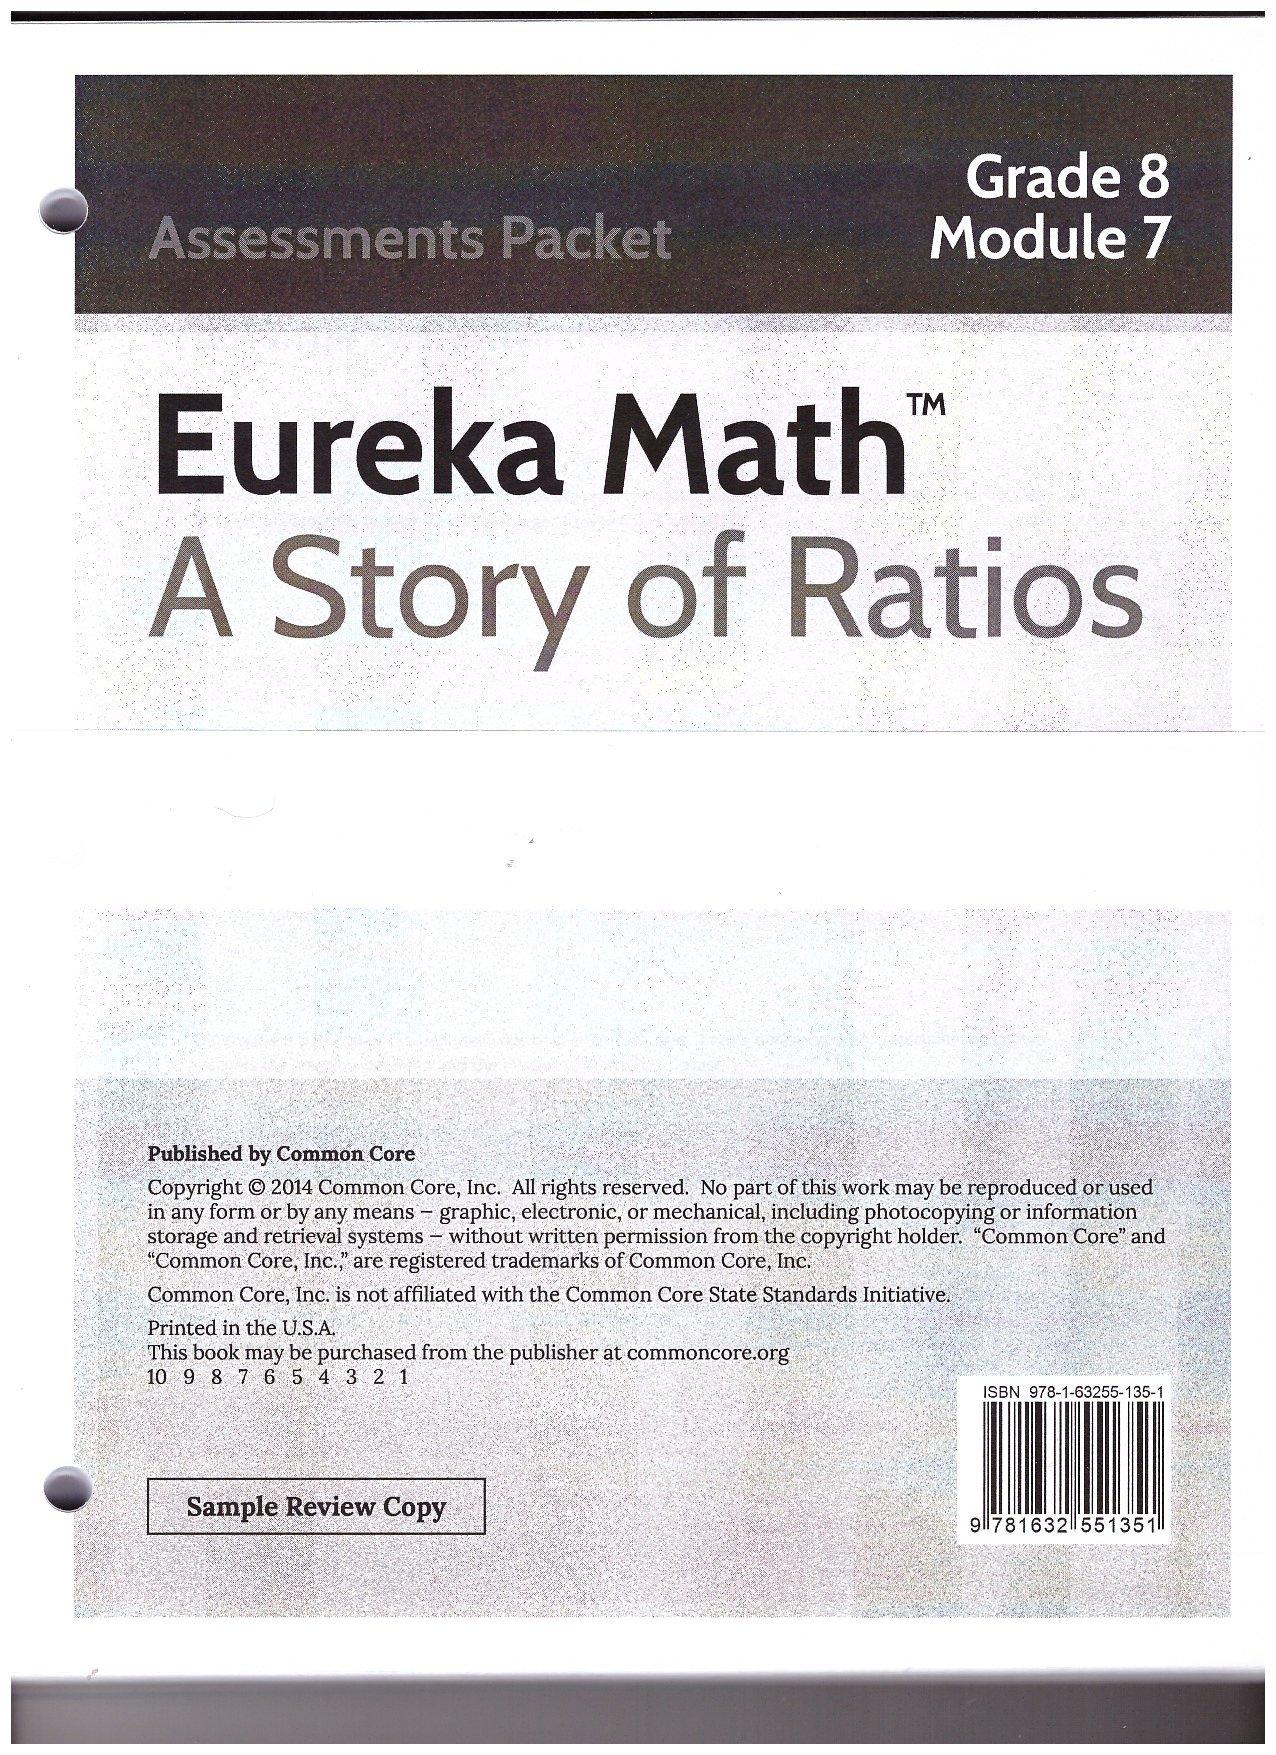 Eureka Math A Story of Ratios Grade 8 Module 7 Assessments